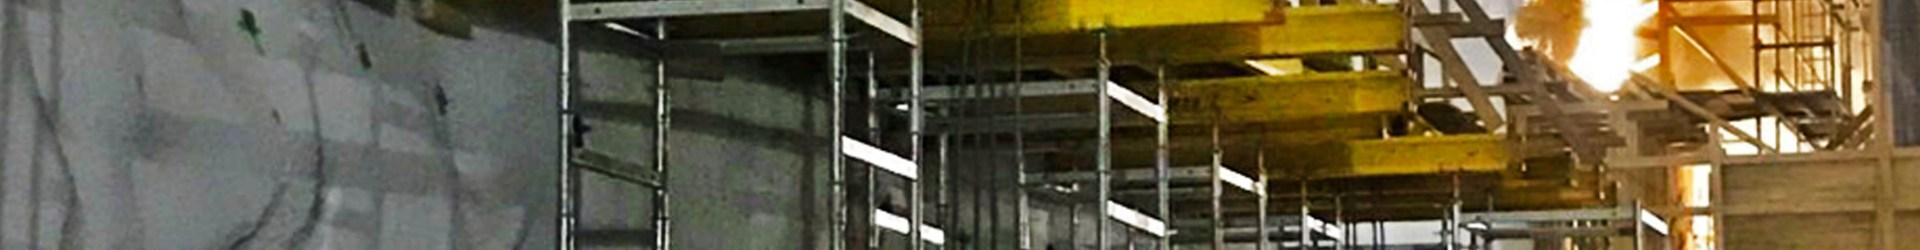 Underground parking Töölö Töölönkatu